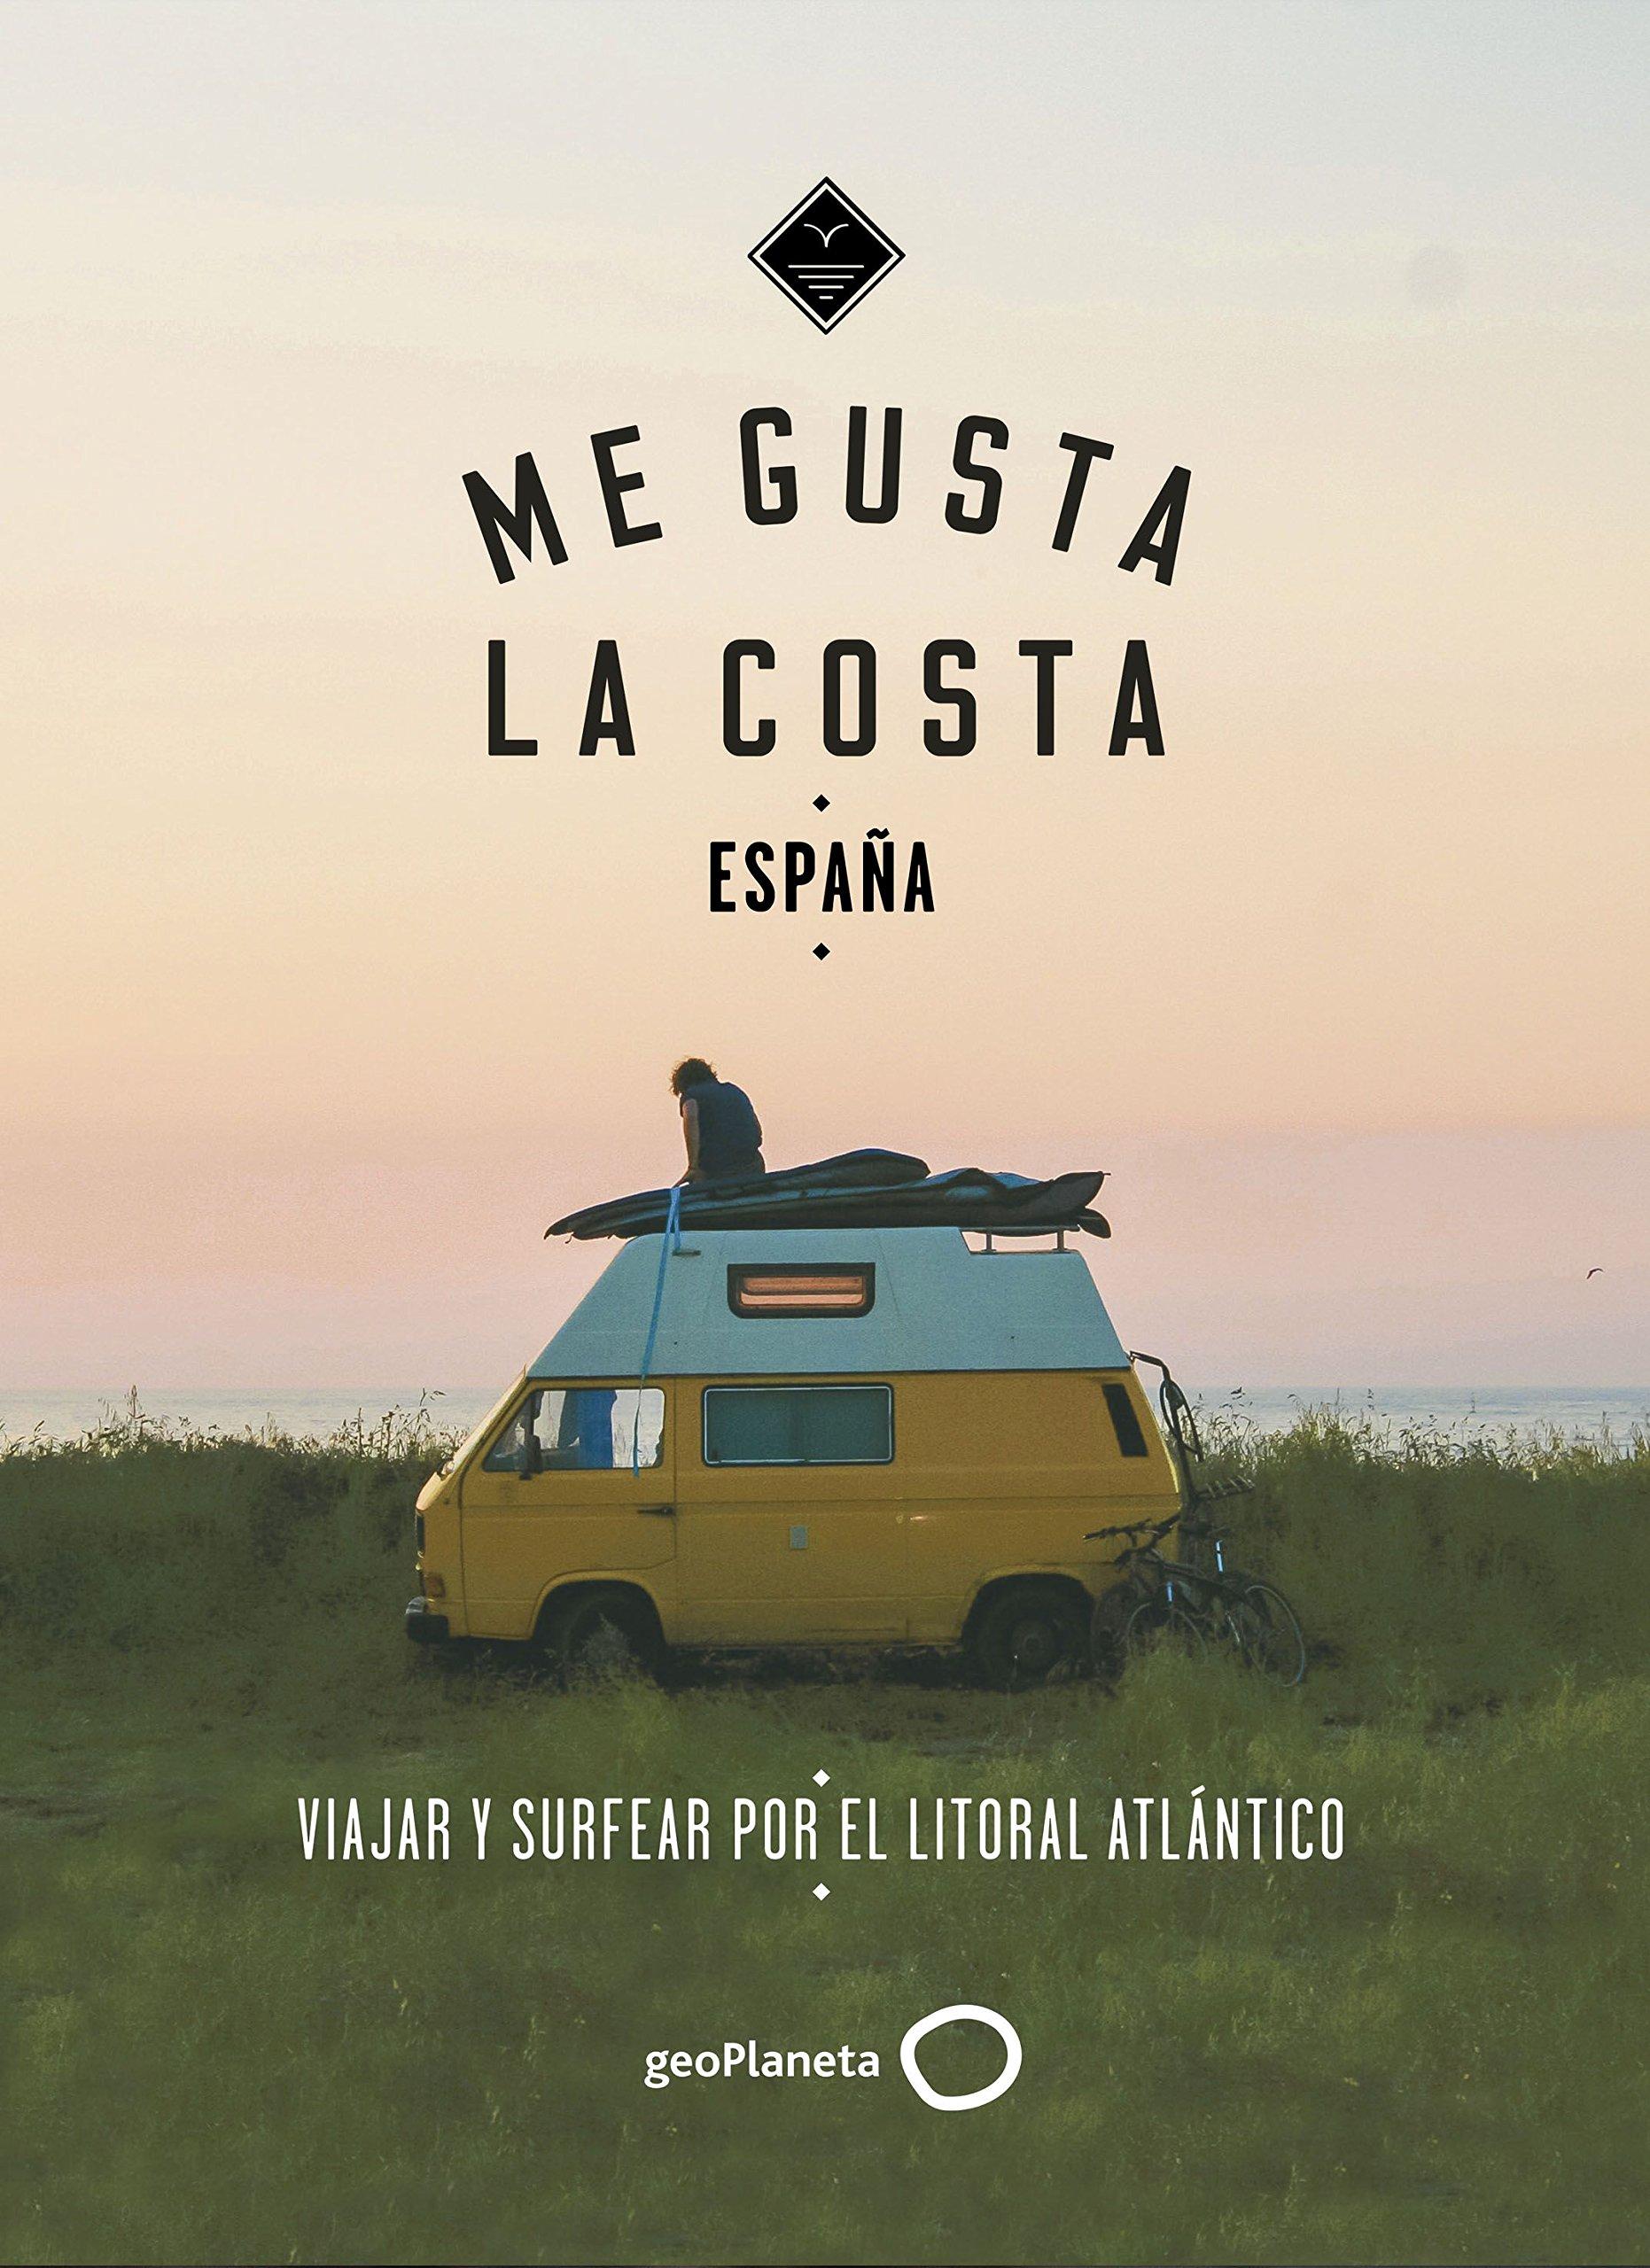 Me gusta la costa en España (Deportes): Amazon.es: Gossink, Alexandra, Middelkoop, Geert-Jan, Fernández Gómez, Gonzalo: Libros